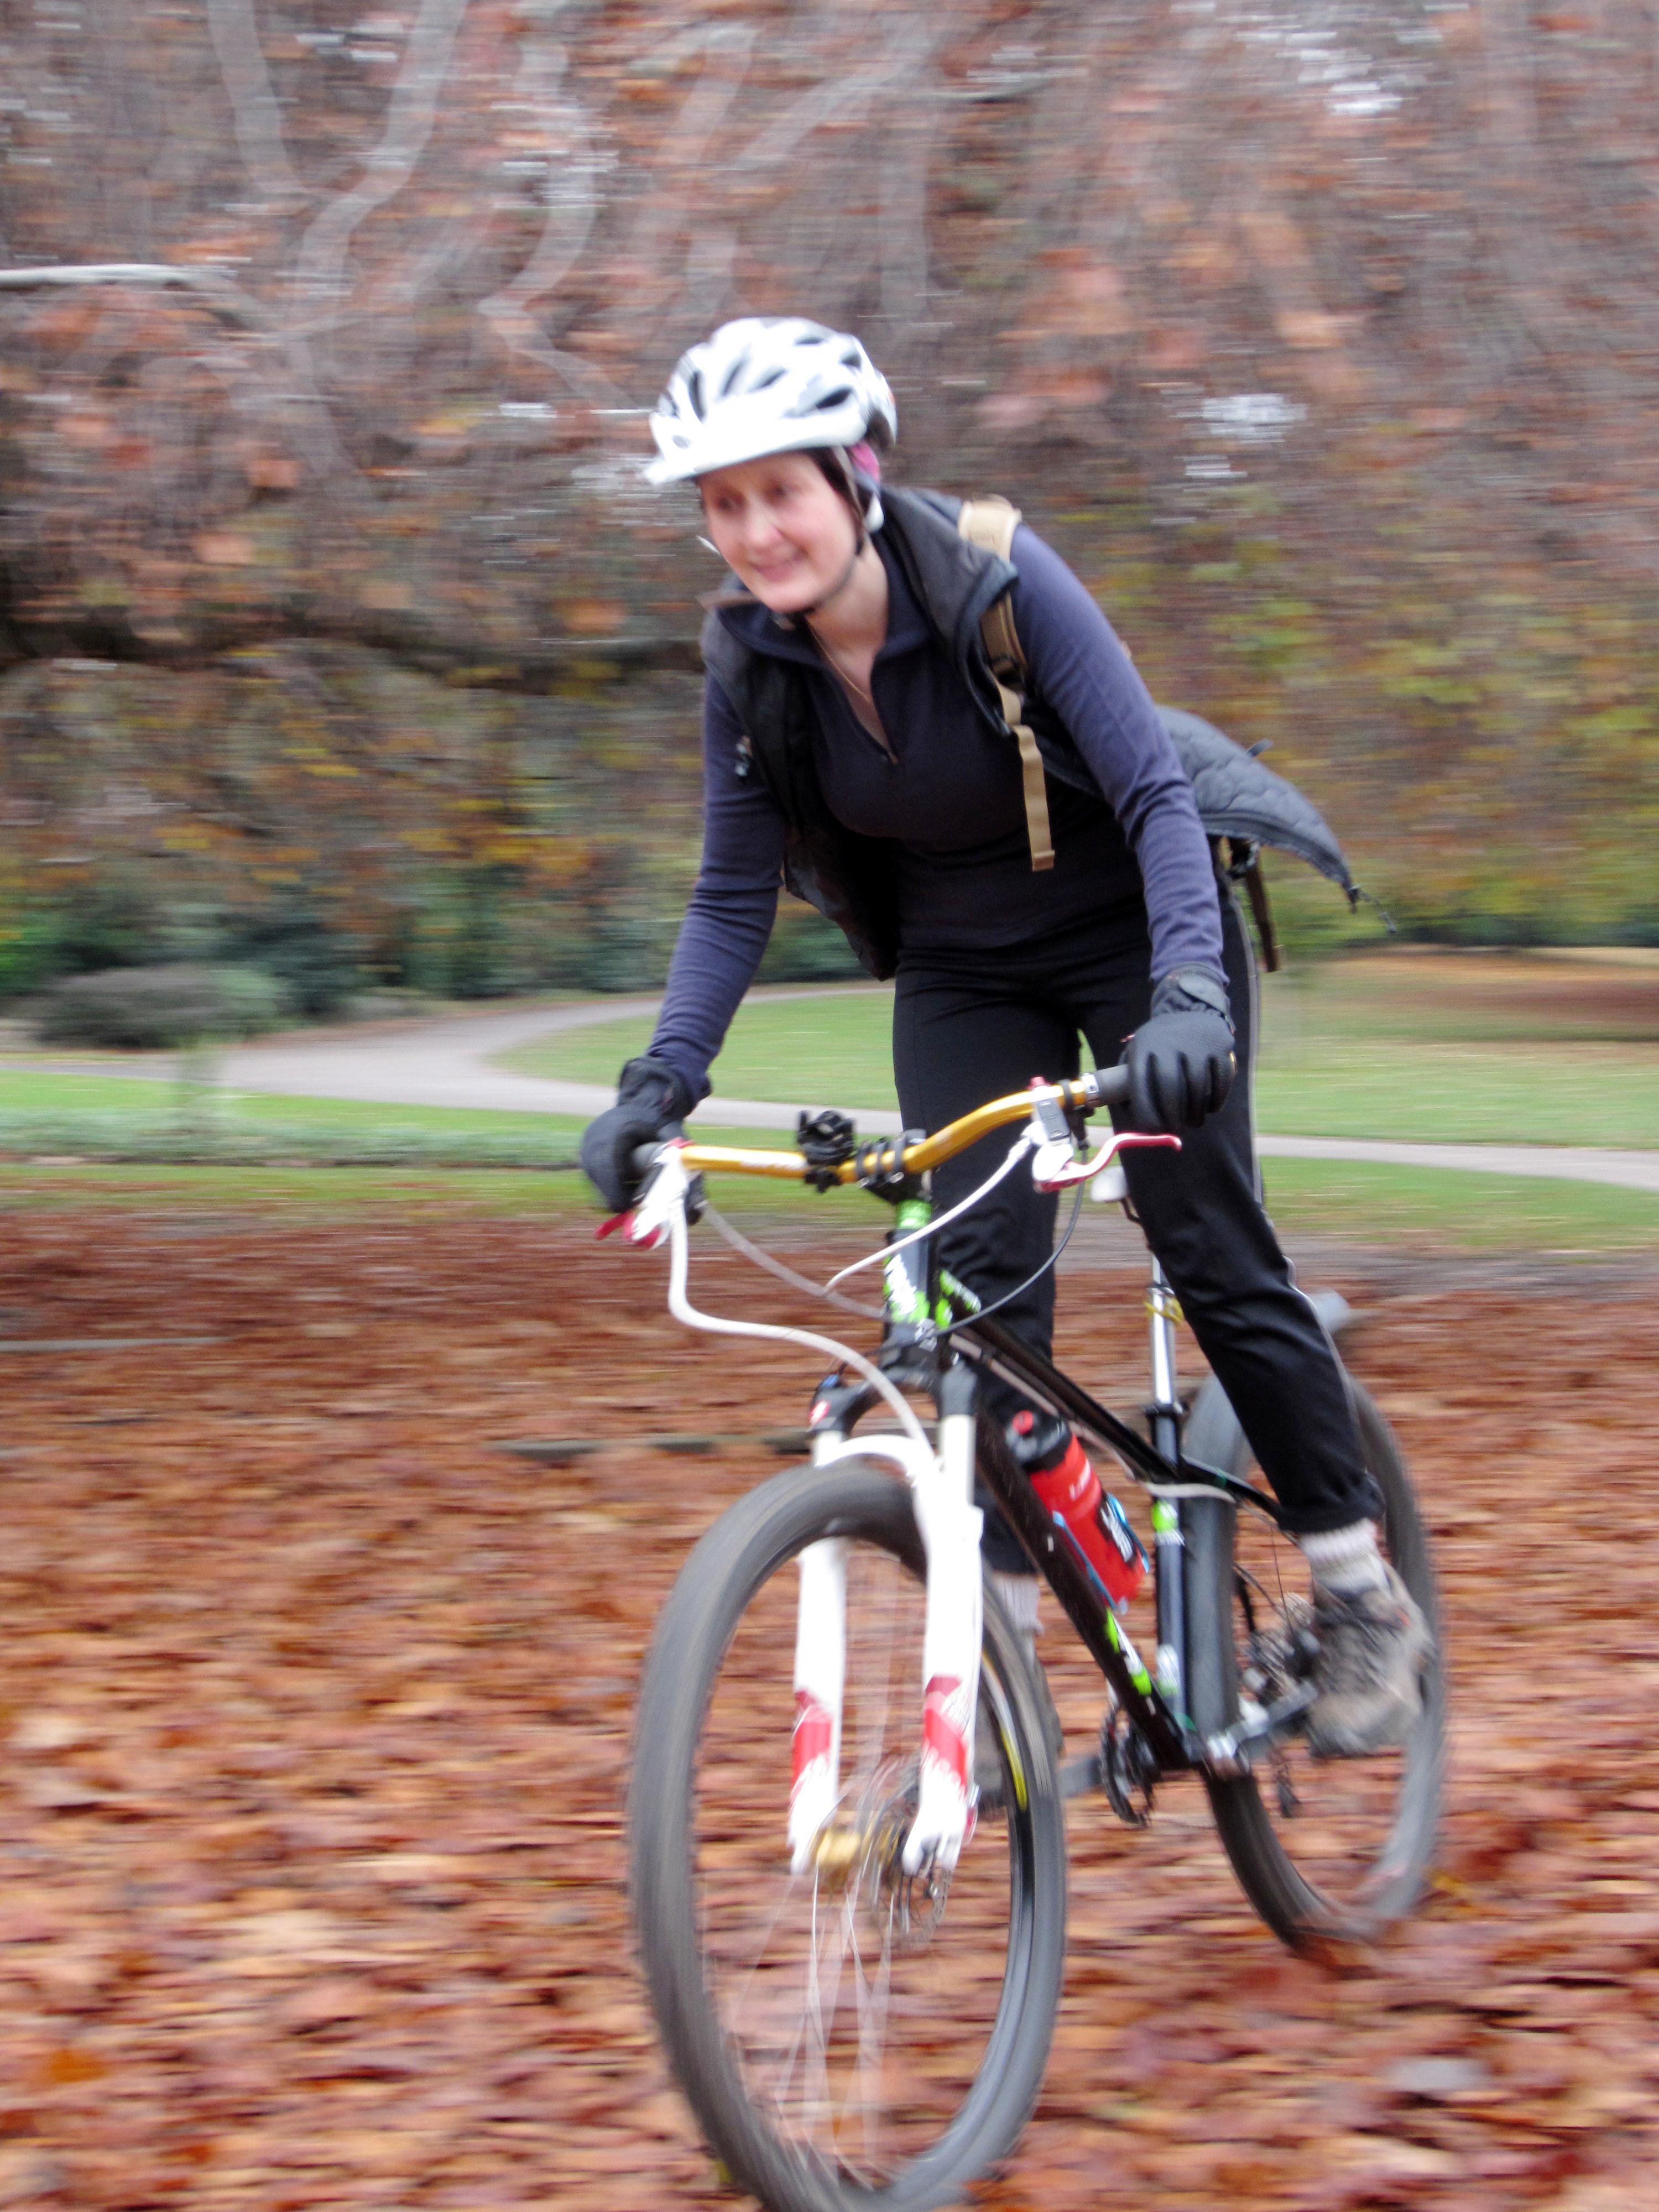 ragley single men Ragley mmmbop hardtail bikeintroducing the next generation  men's jackets  ragley - 740mm wide, 15mm rise grips: ragley single lock on headset: fsa no.